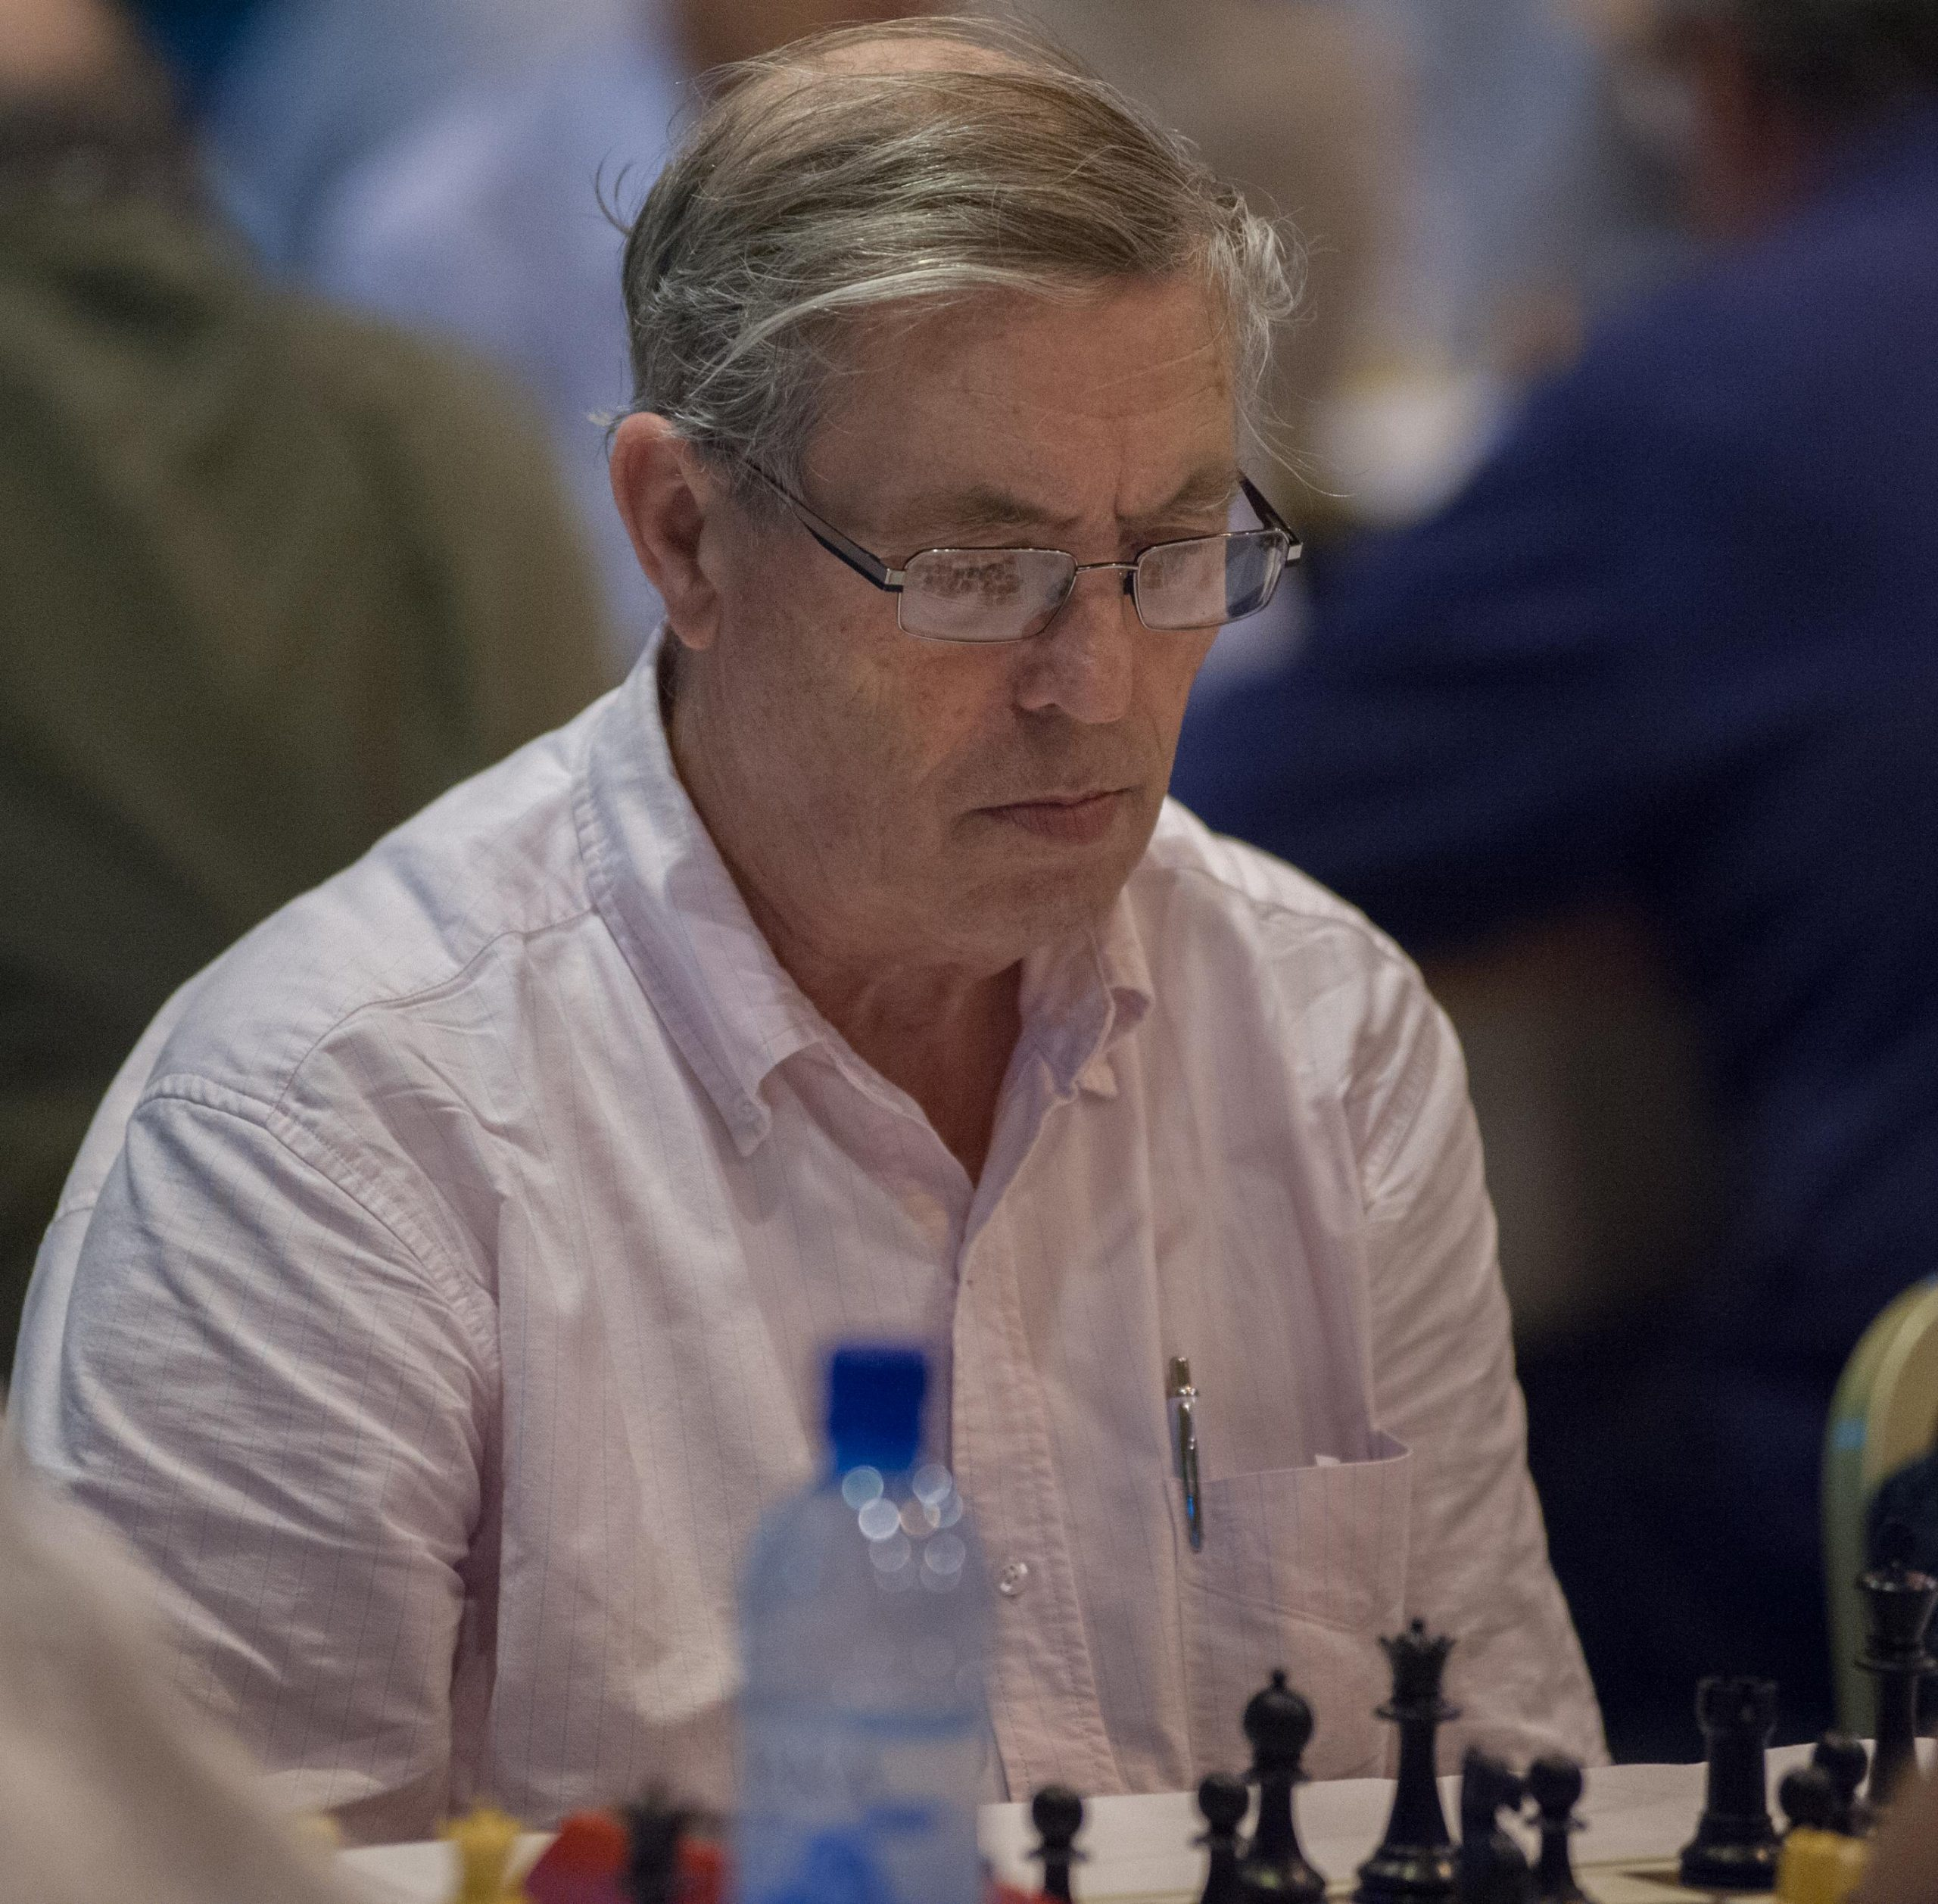 David Levens, British Championships, Torquay, 2013, Round 11